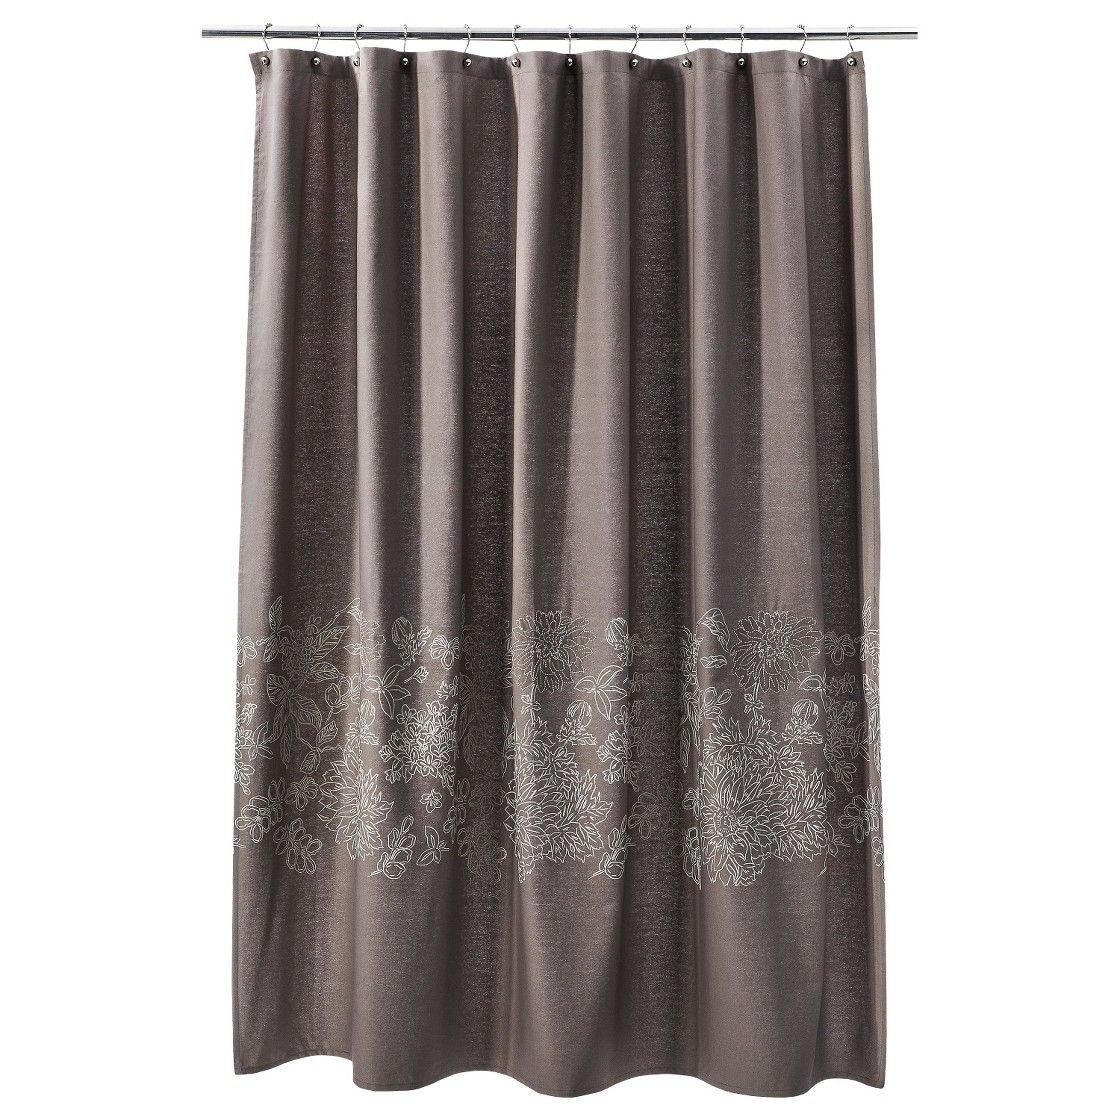 Threshold floral shower curtain brown linen basement